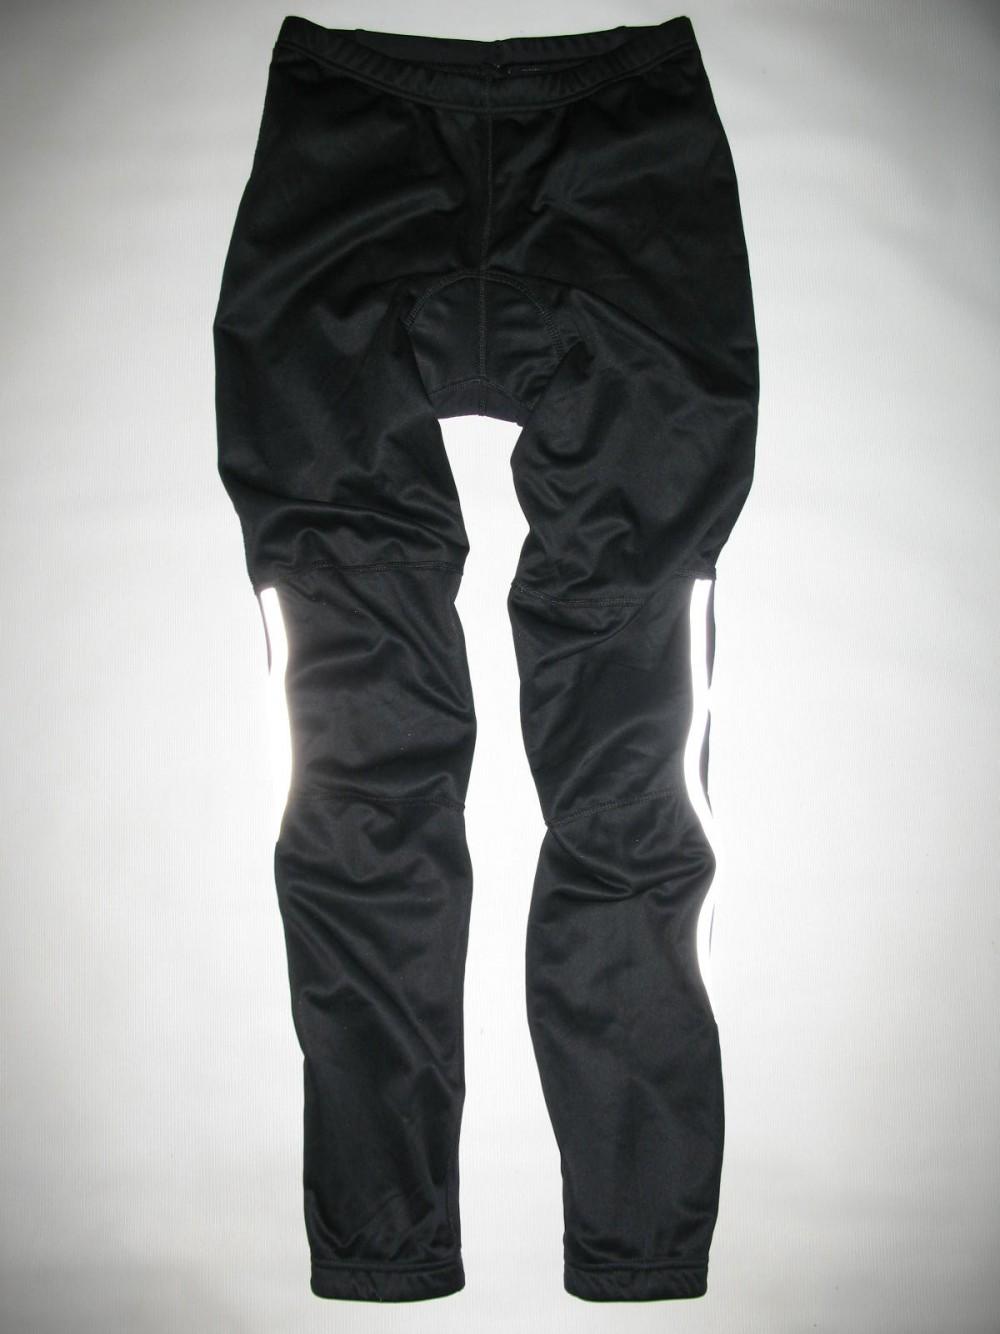 Велобрюки CRANE windstopper cycling pants lady (размер 38-М) - 1